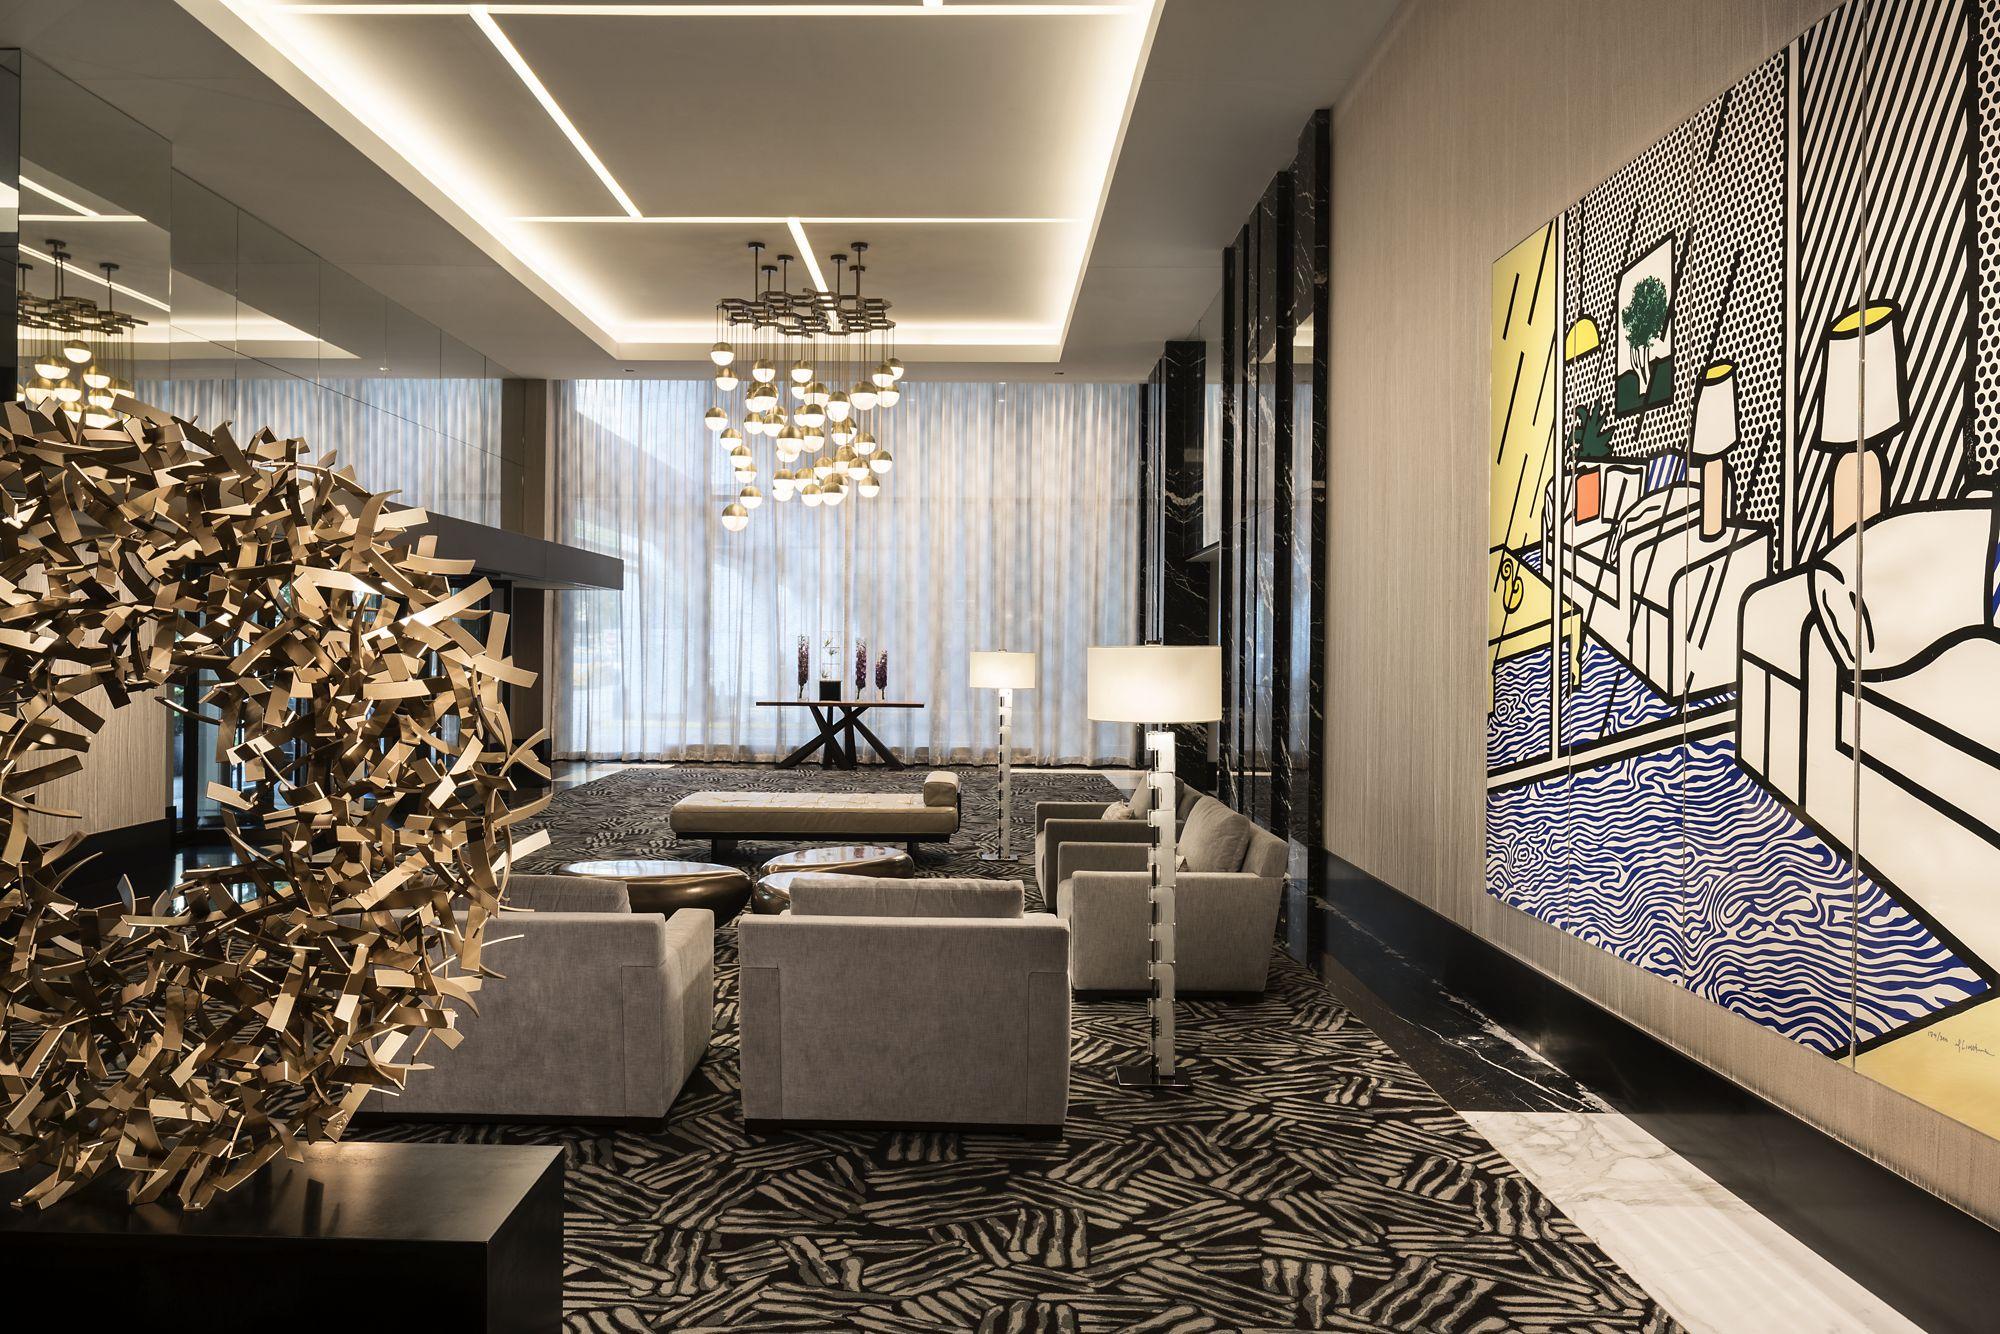 The Ritz-Carlton, Chicago image 7